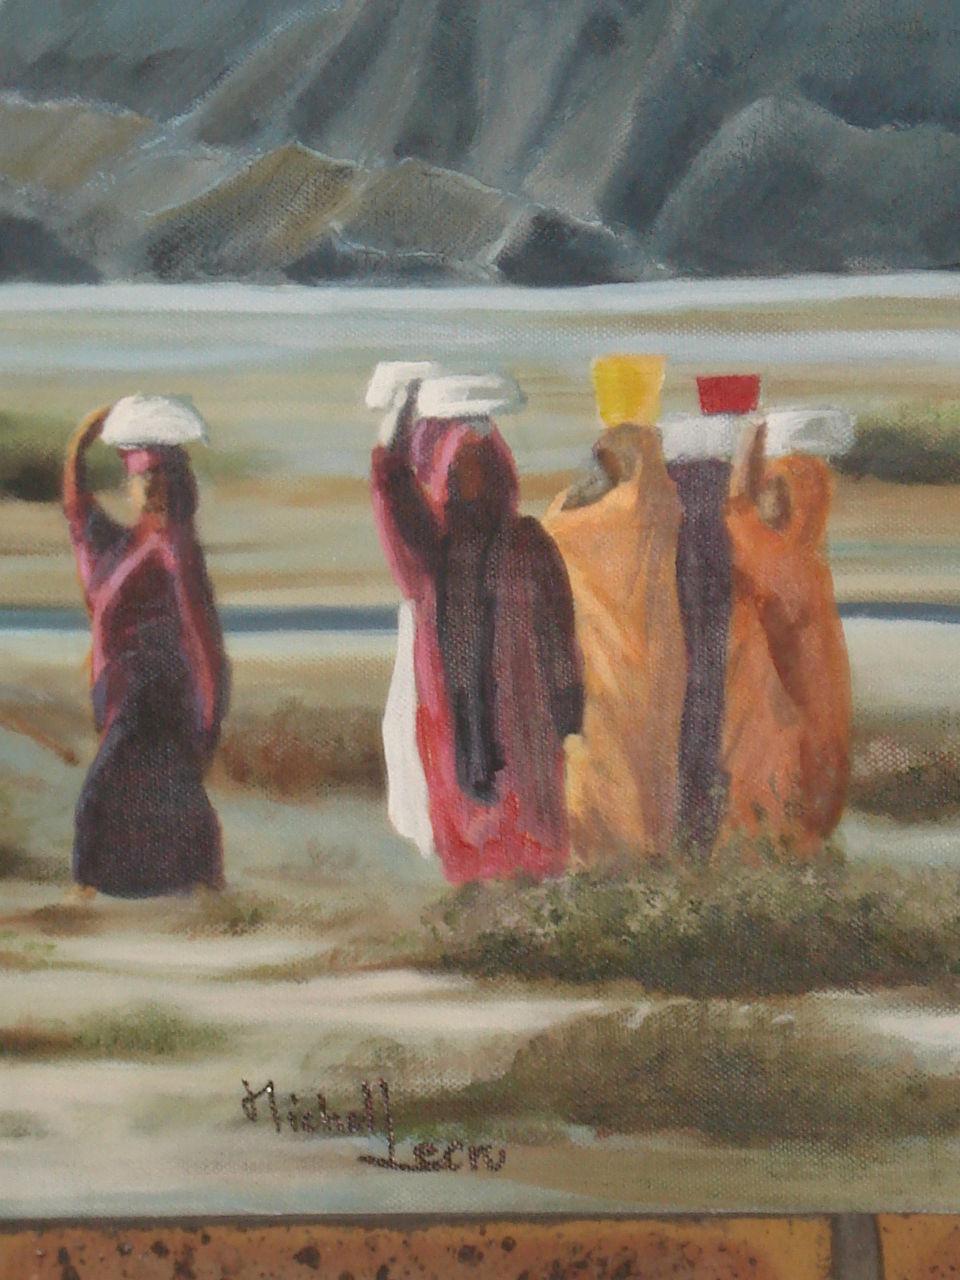 michel lecru Femmes BALOUTHES nomades